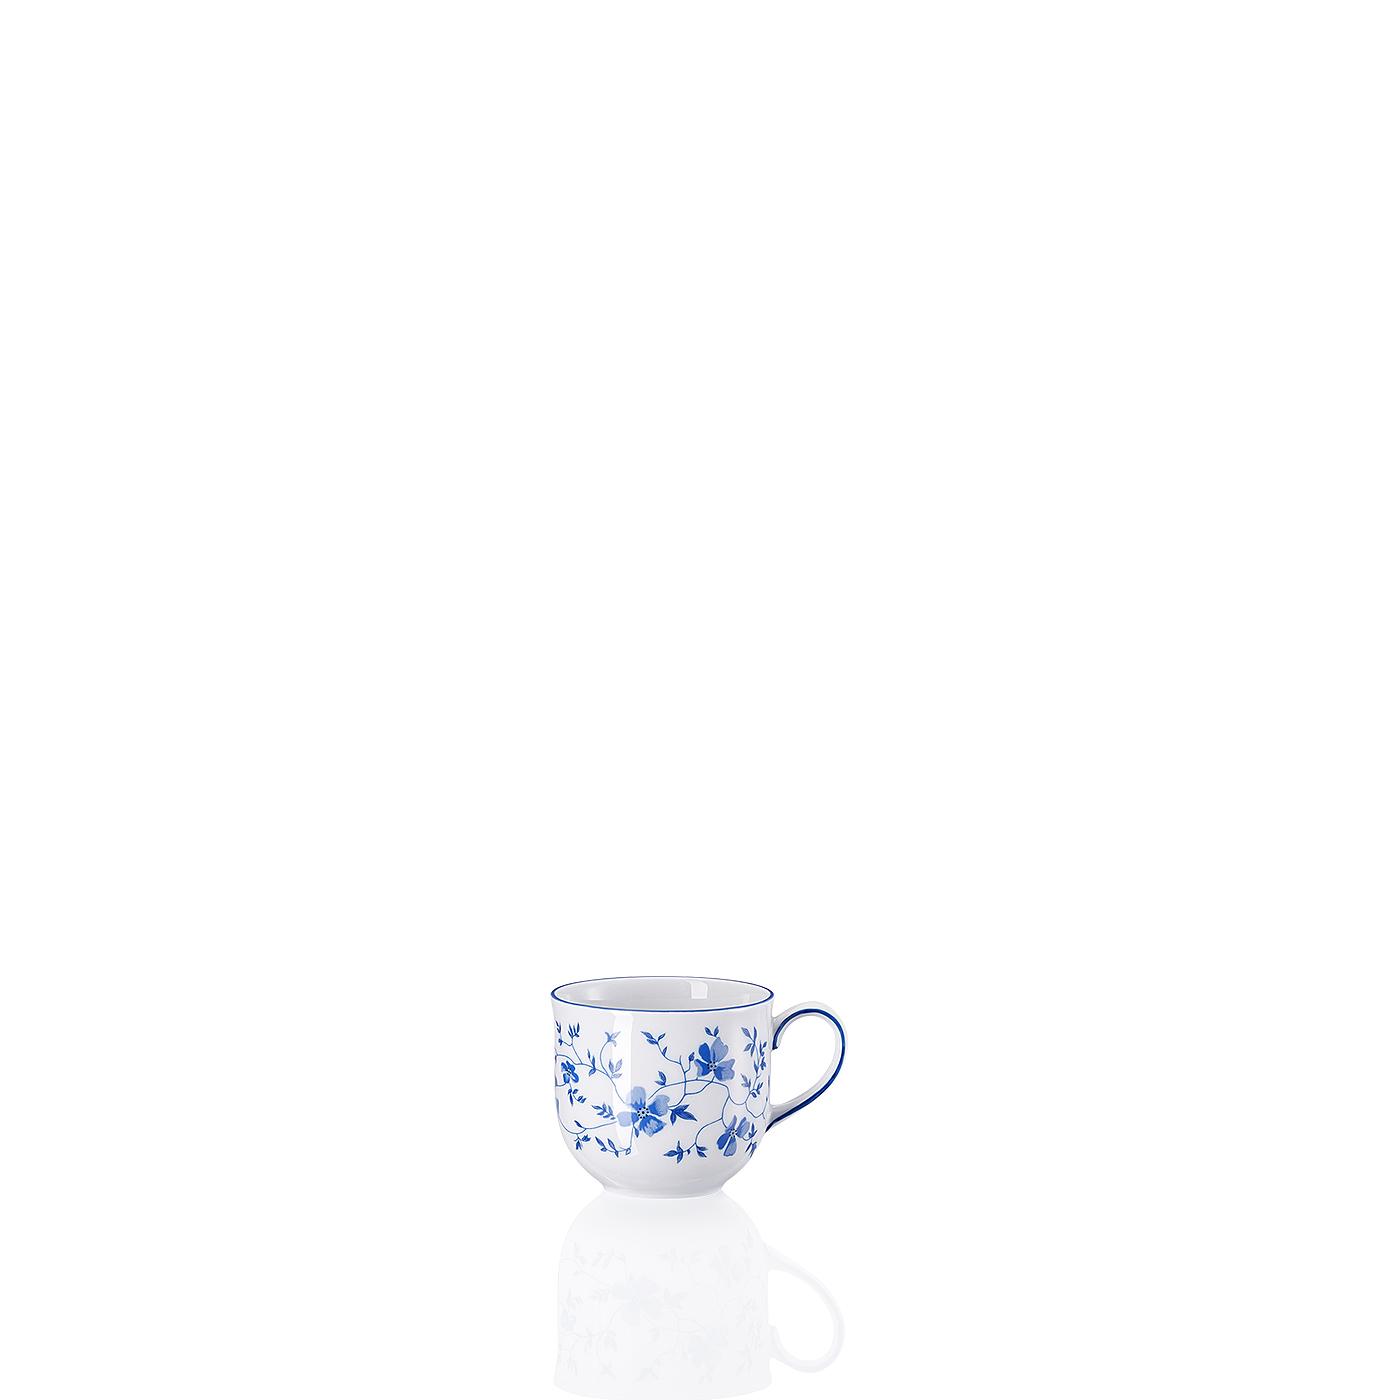 Espresso-/Mokka-Obertasse Form 1382 Blaublüten Arzberg